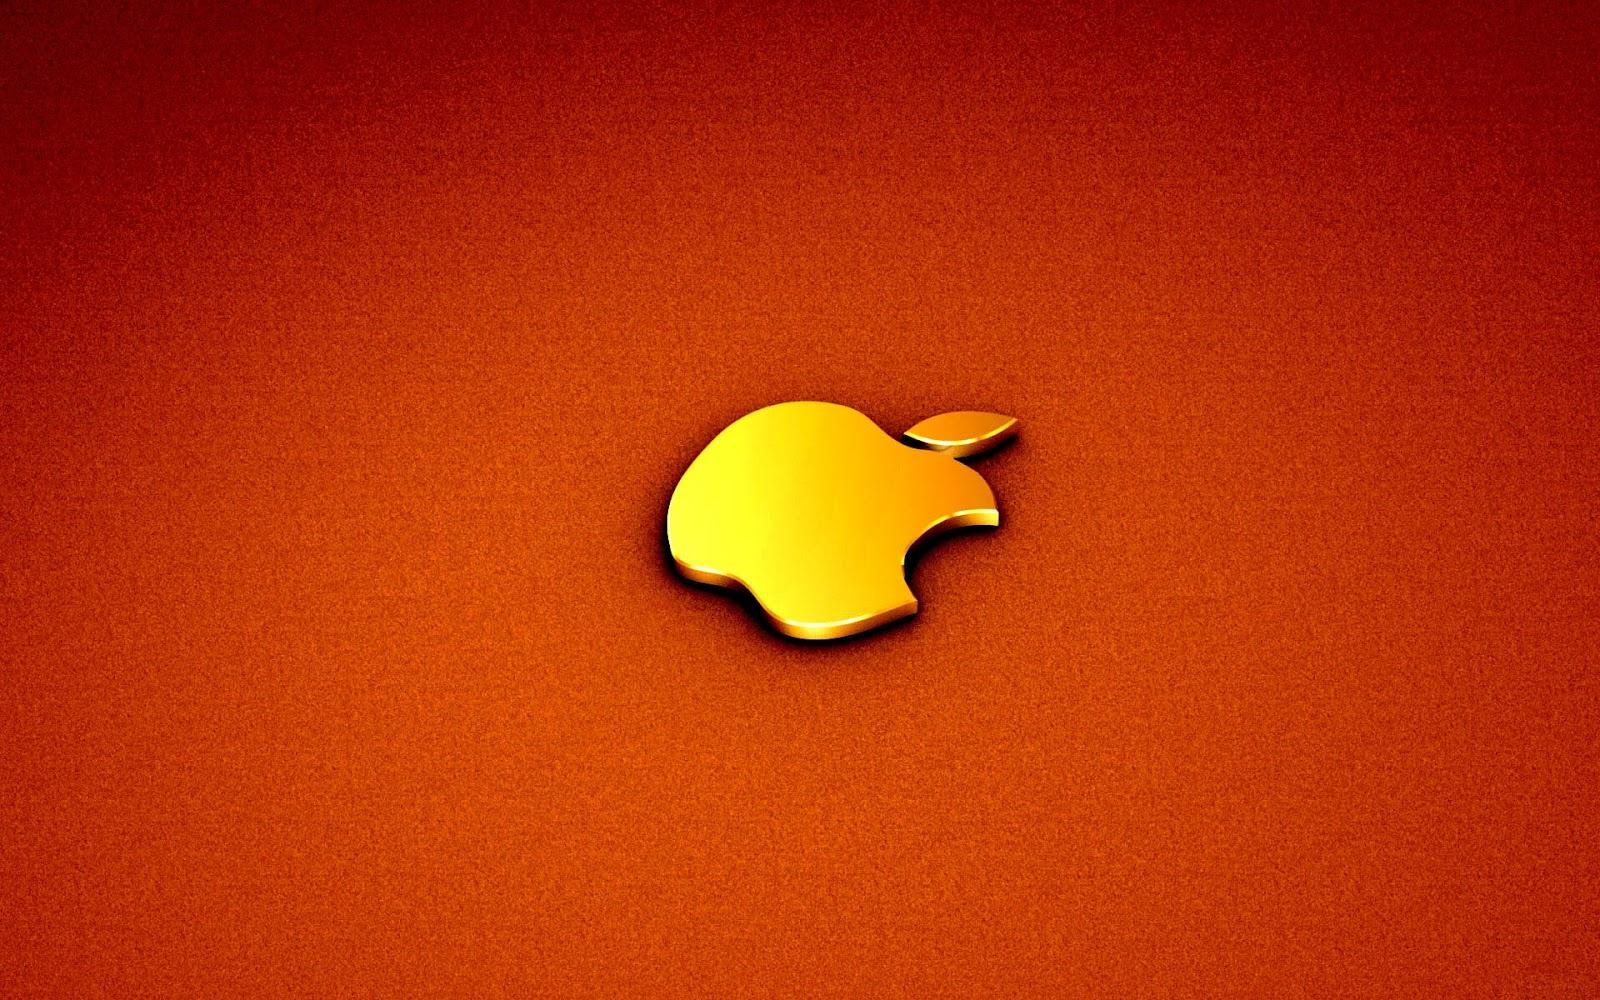 yellow apple logo - photo #4